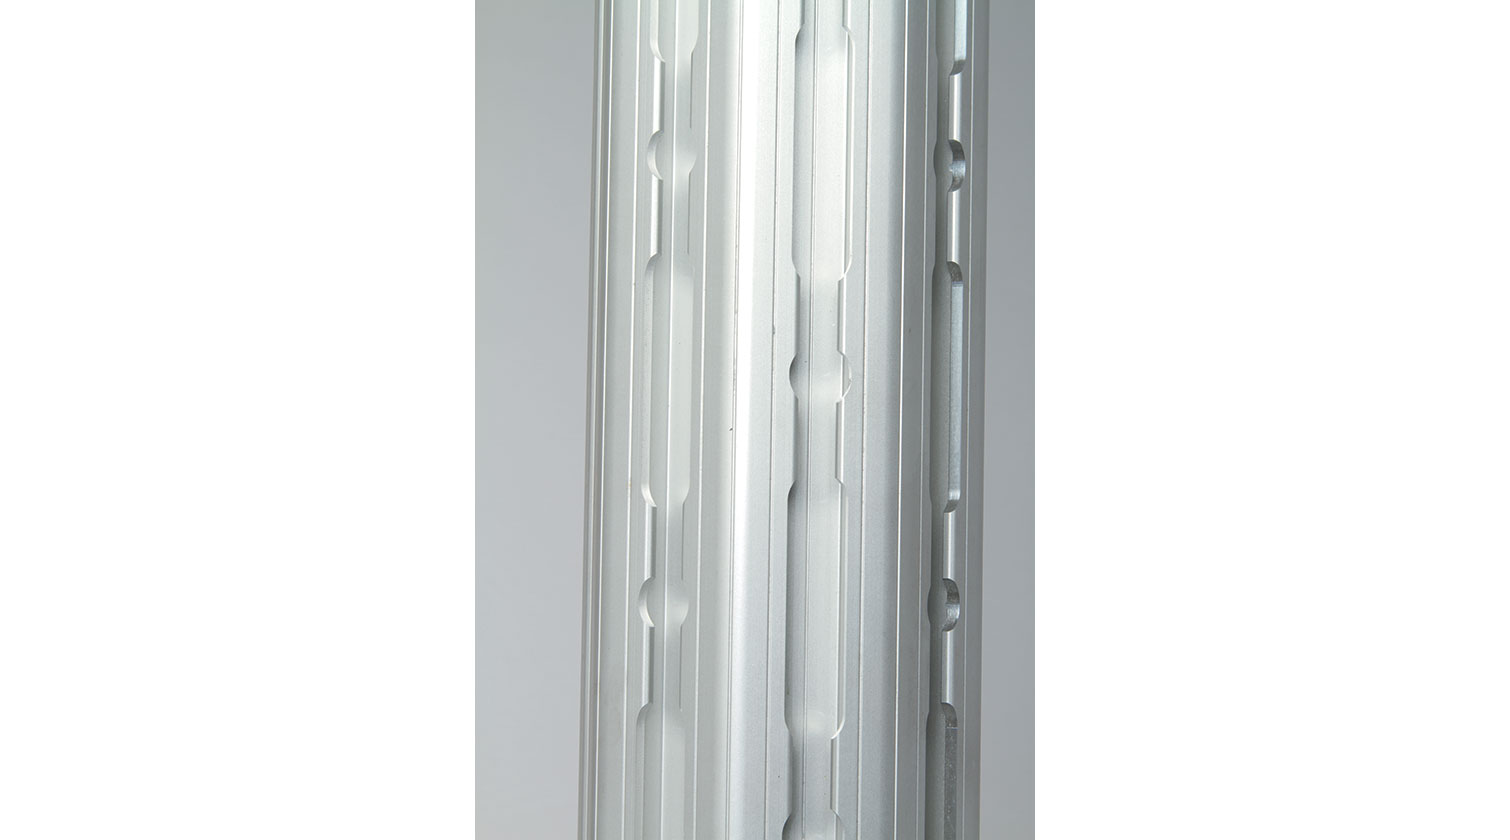 INT micro milling rapid prototyping CNC Imes Icore Platinum X5 aluminum sample 2